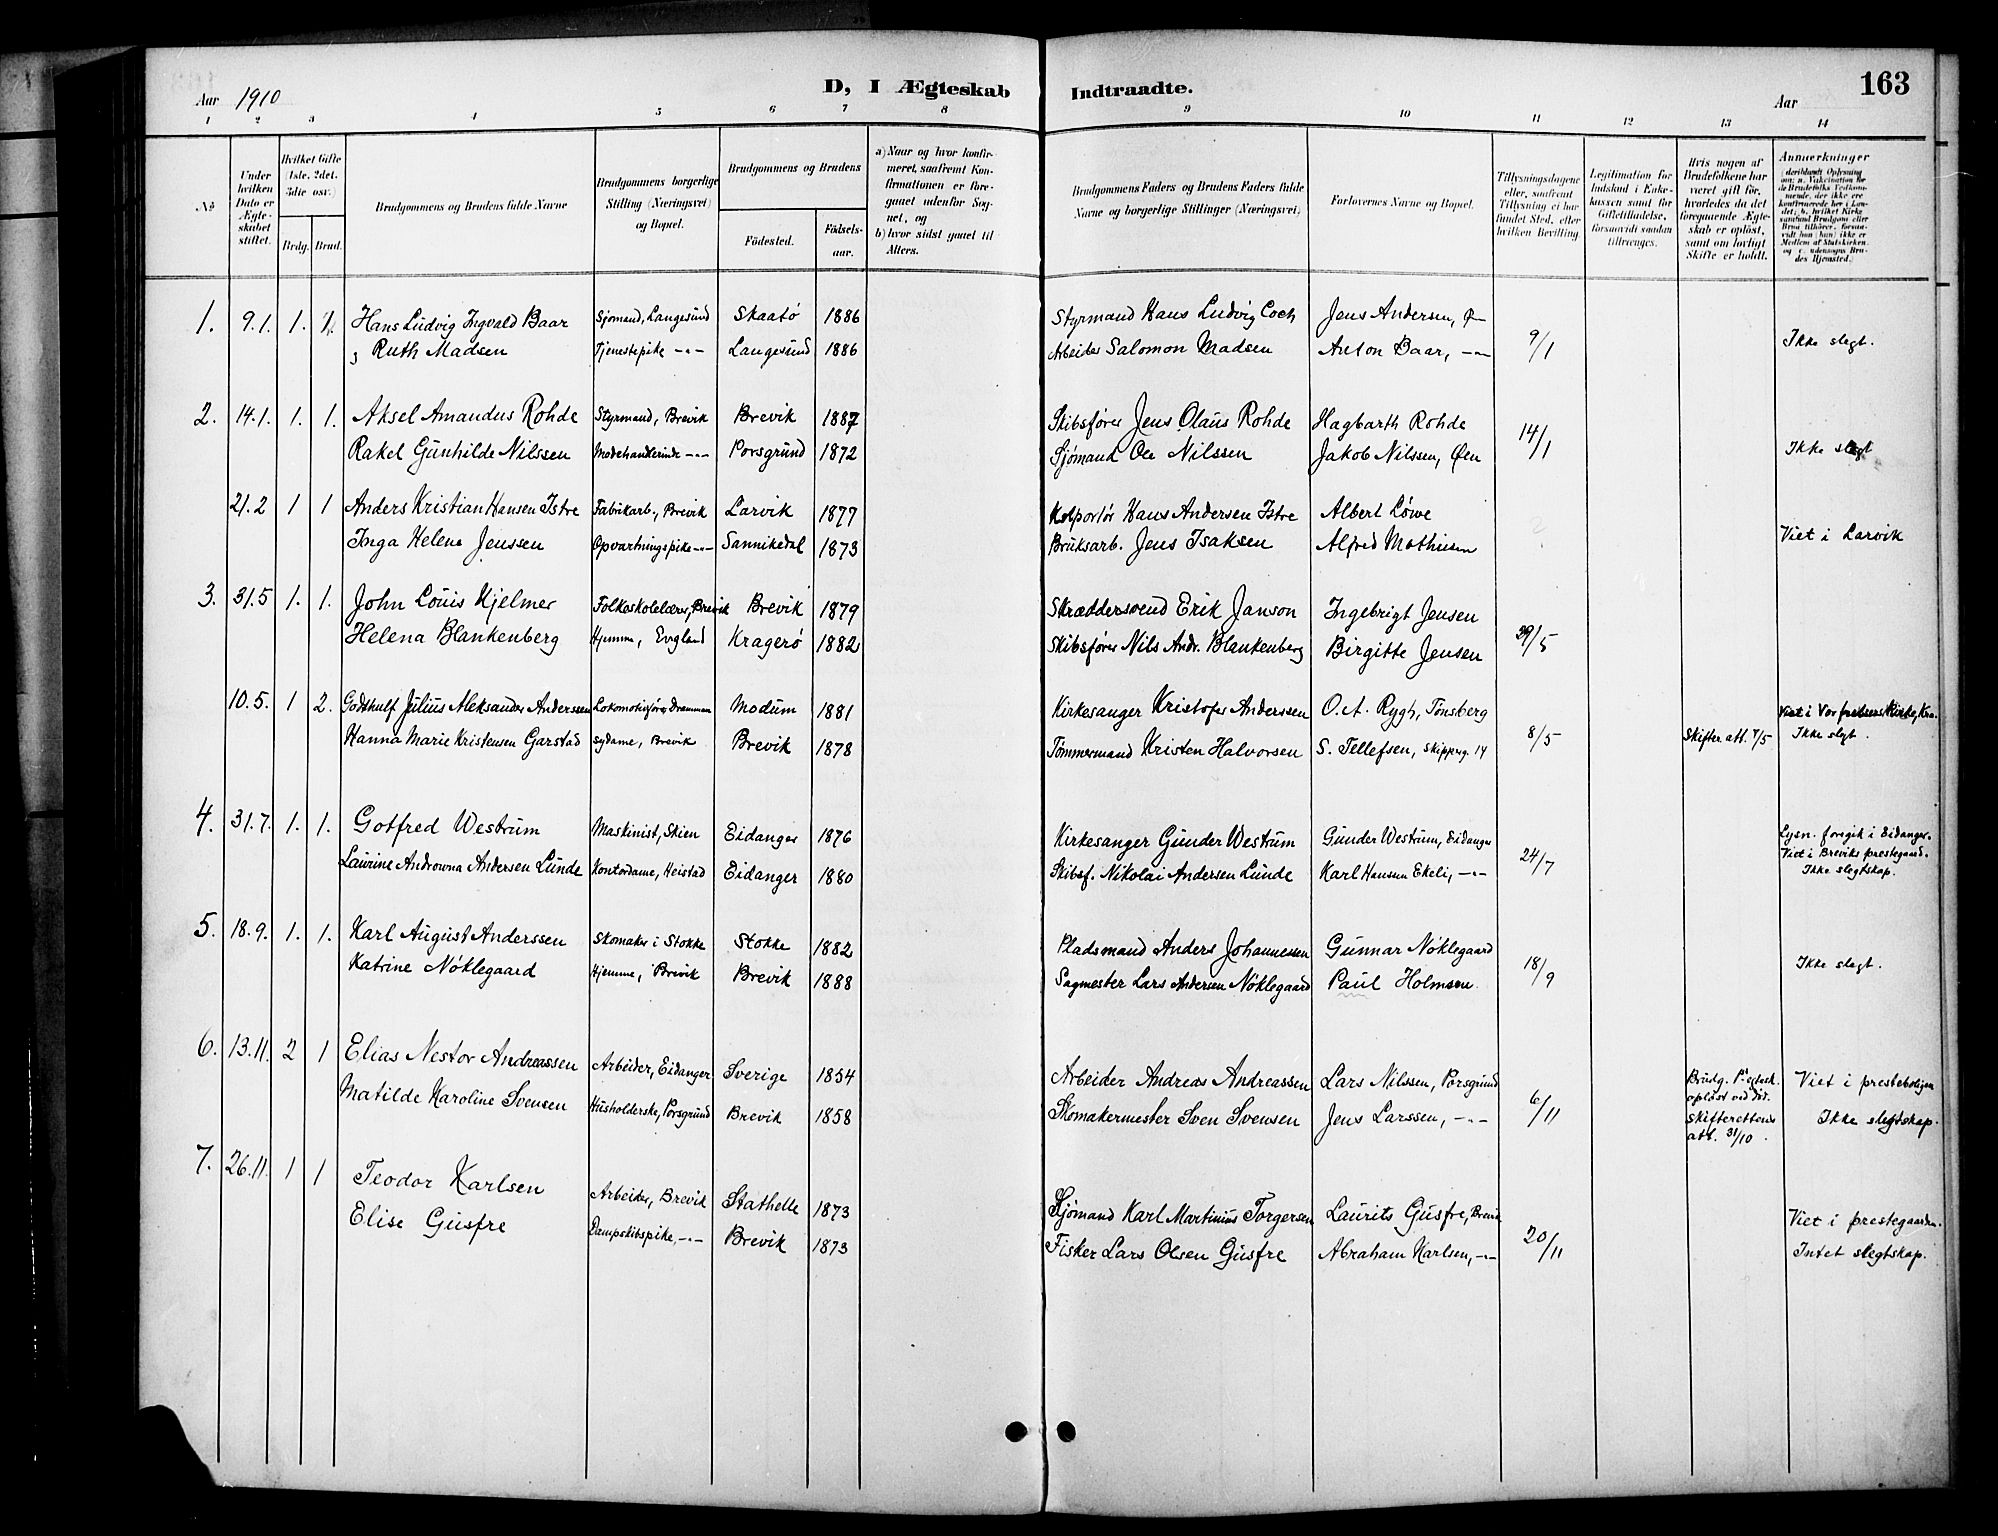 SAKO, Brevik kirkebøker, G/Ga/L0005: Klokkerbok nr. 5, 1901-1924, s. 163